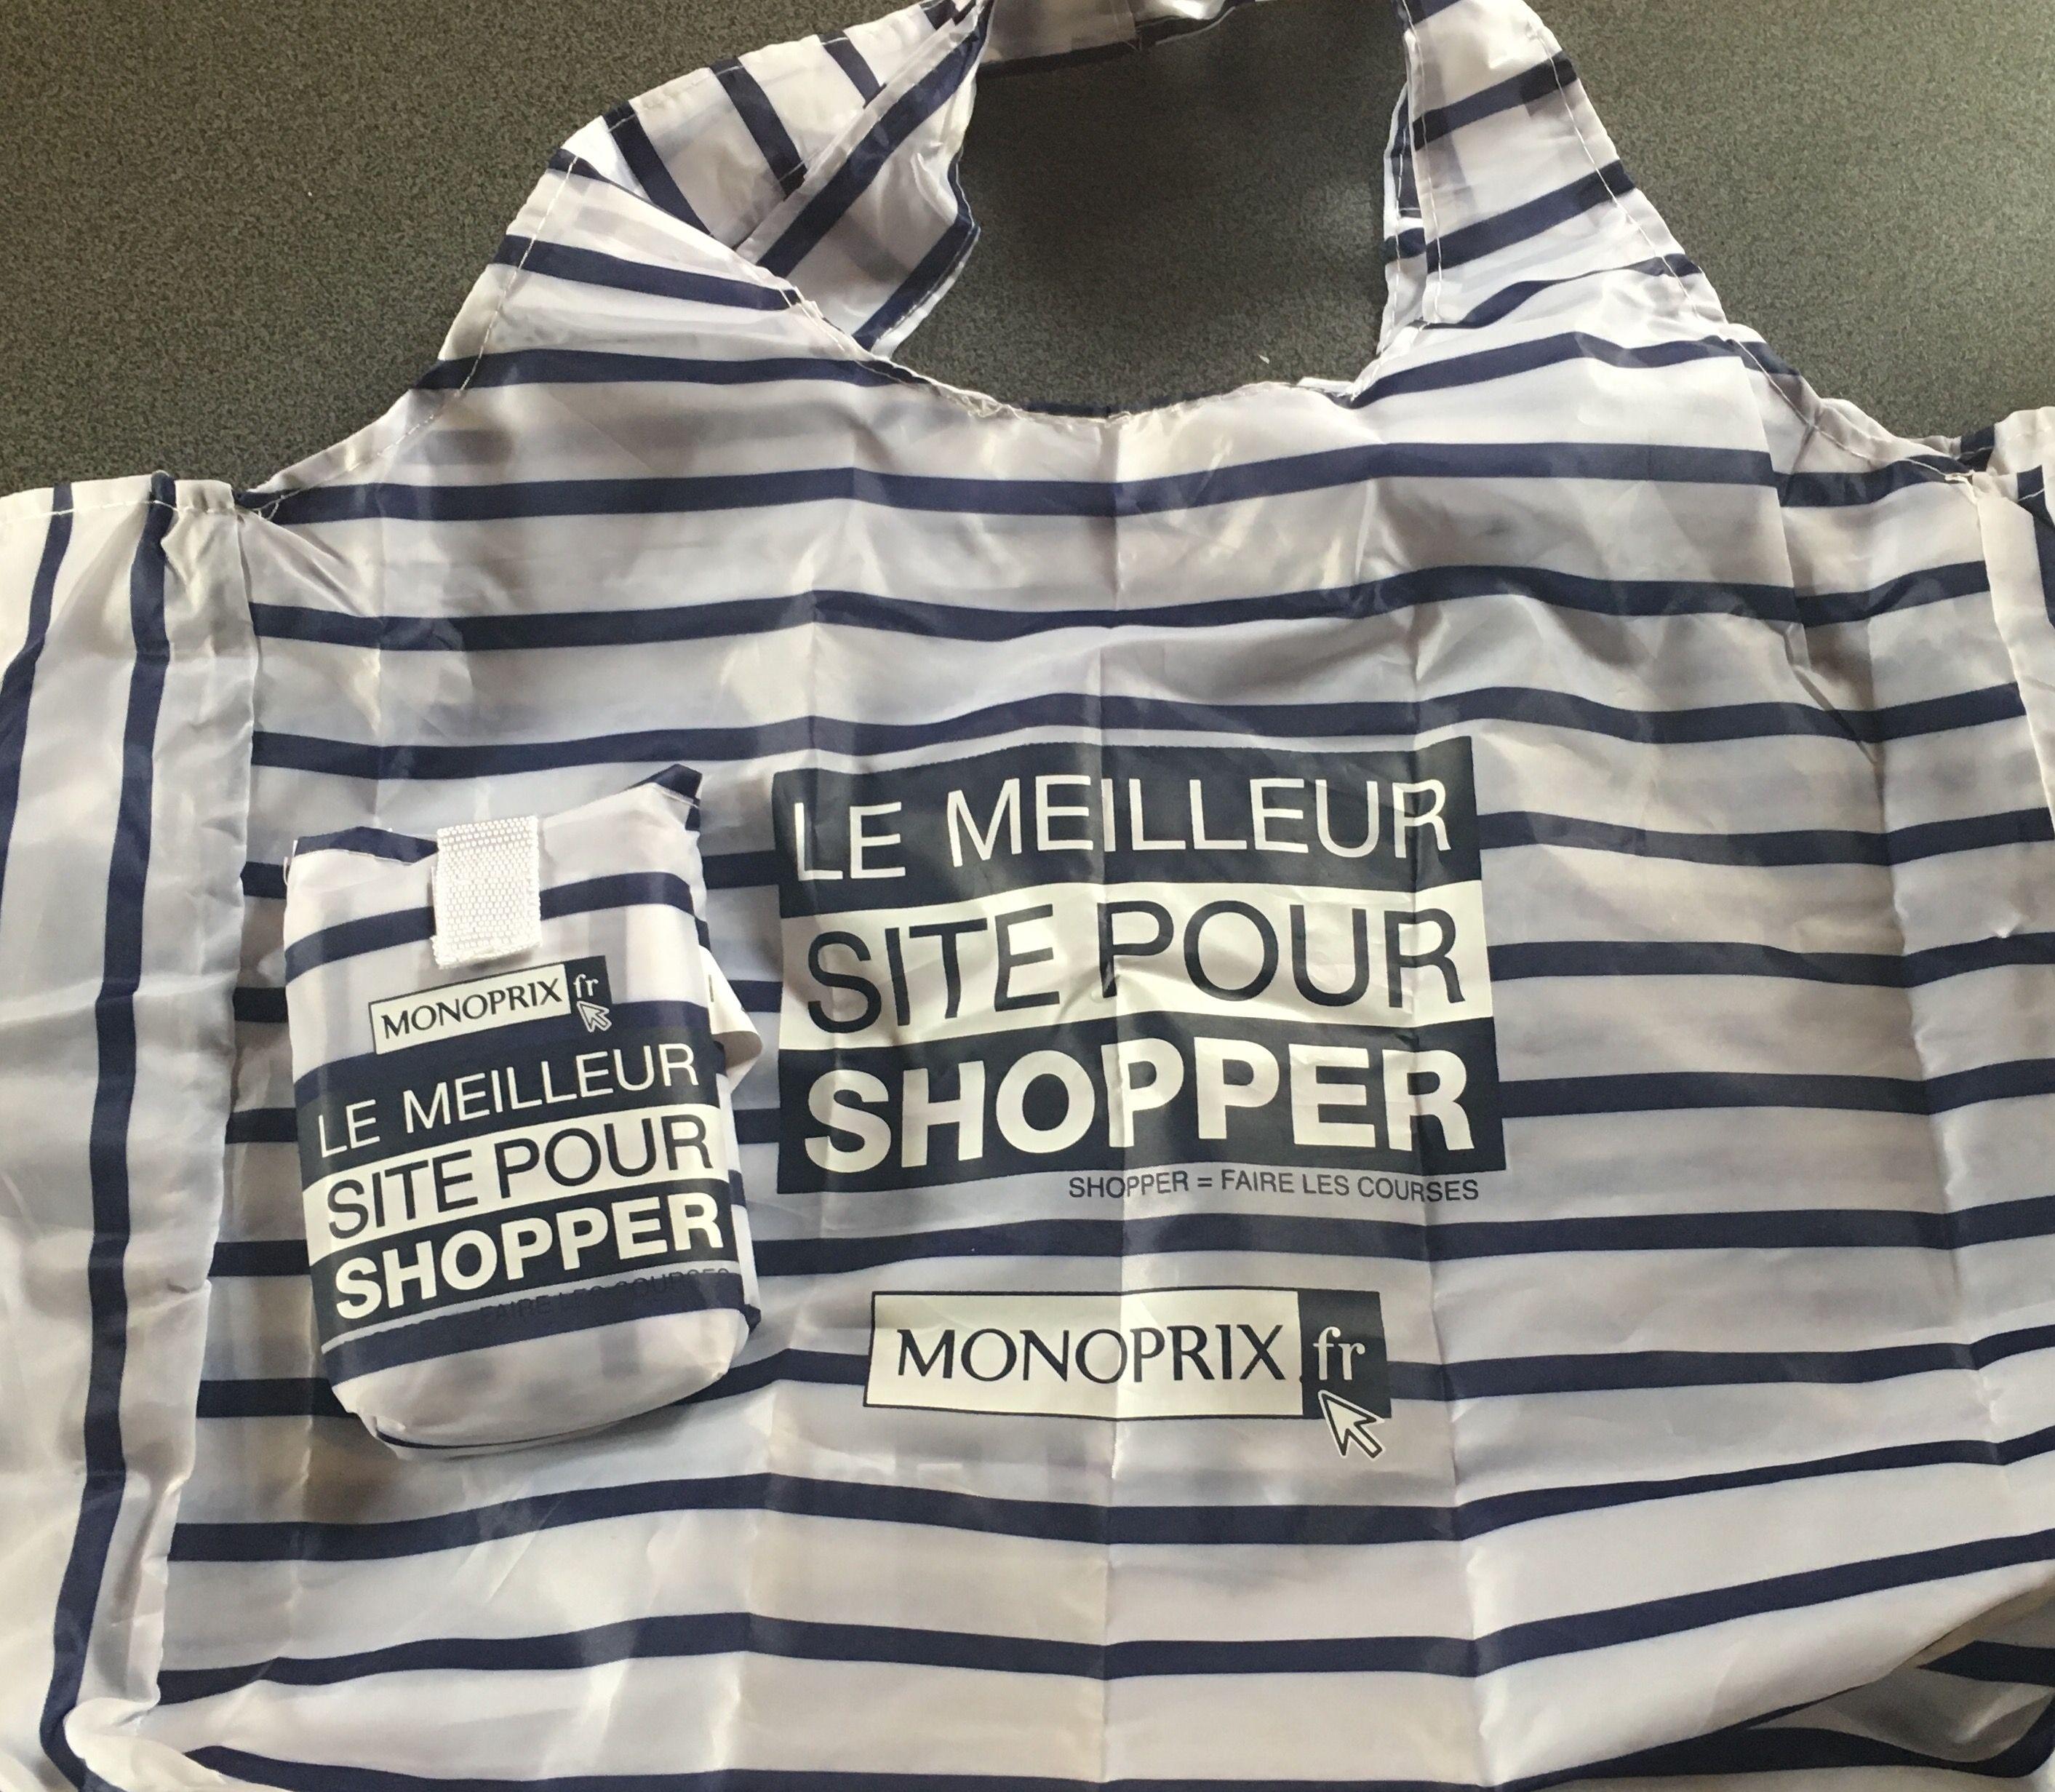 Le rayé bleu marine  - sac Monoprix j'adore les courses en sac Eiffel Tower shopping bag tote  Monoprix